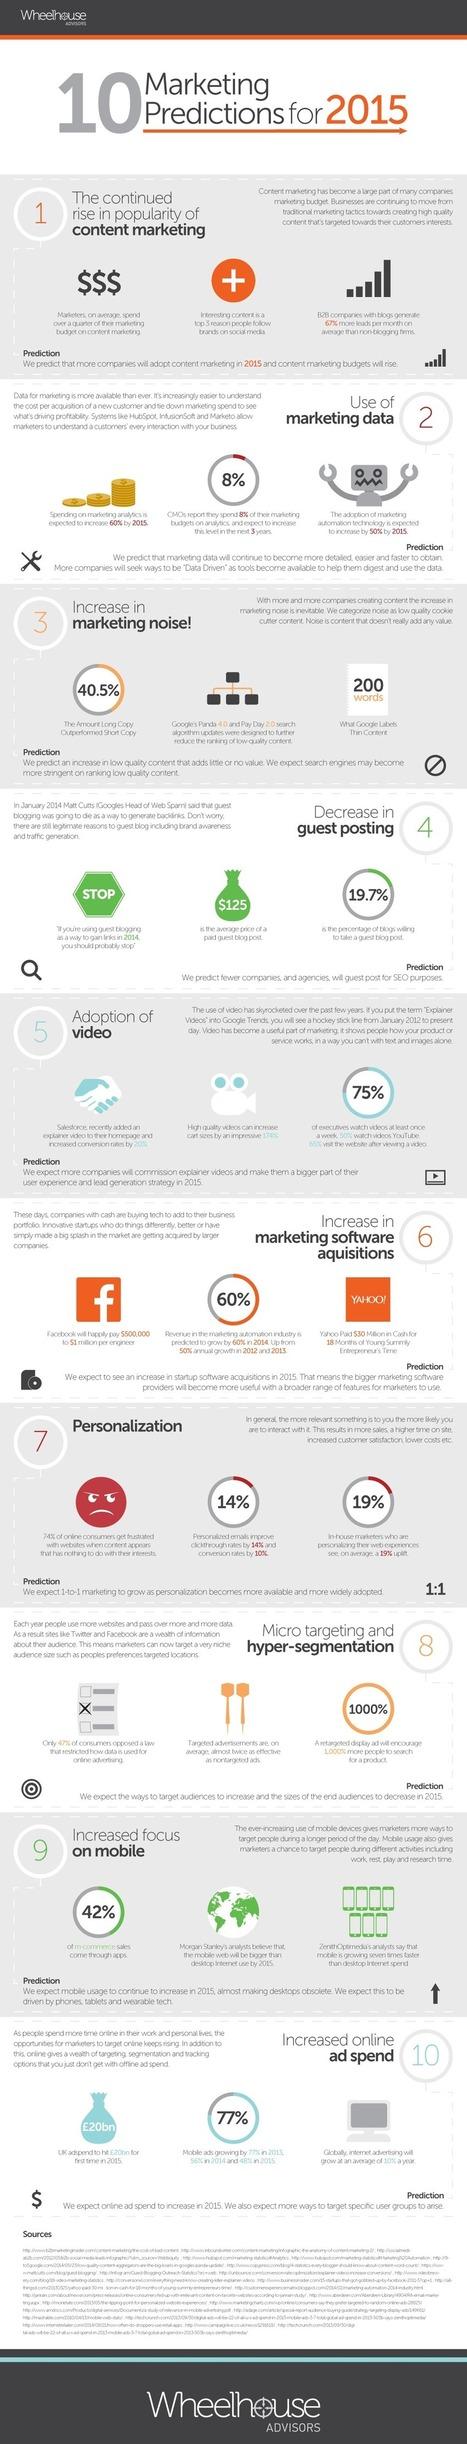 15 predicciones de marketing para 2014 #infografia #infographic #marketing   Seo, Social Media Marketing   Scoop.it